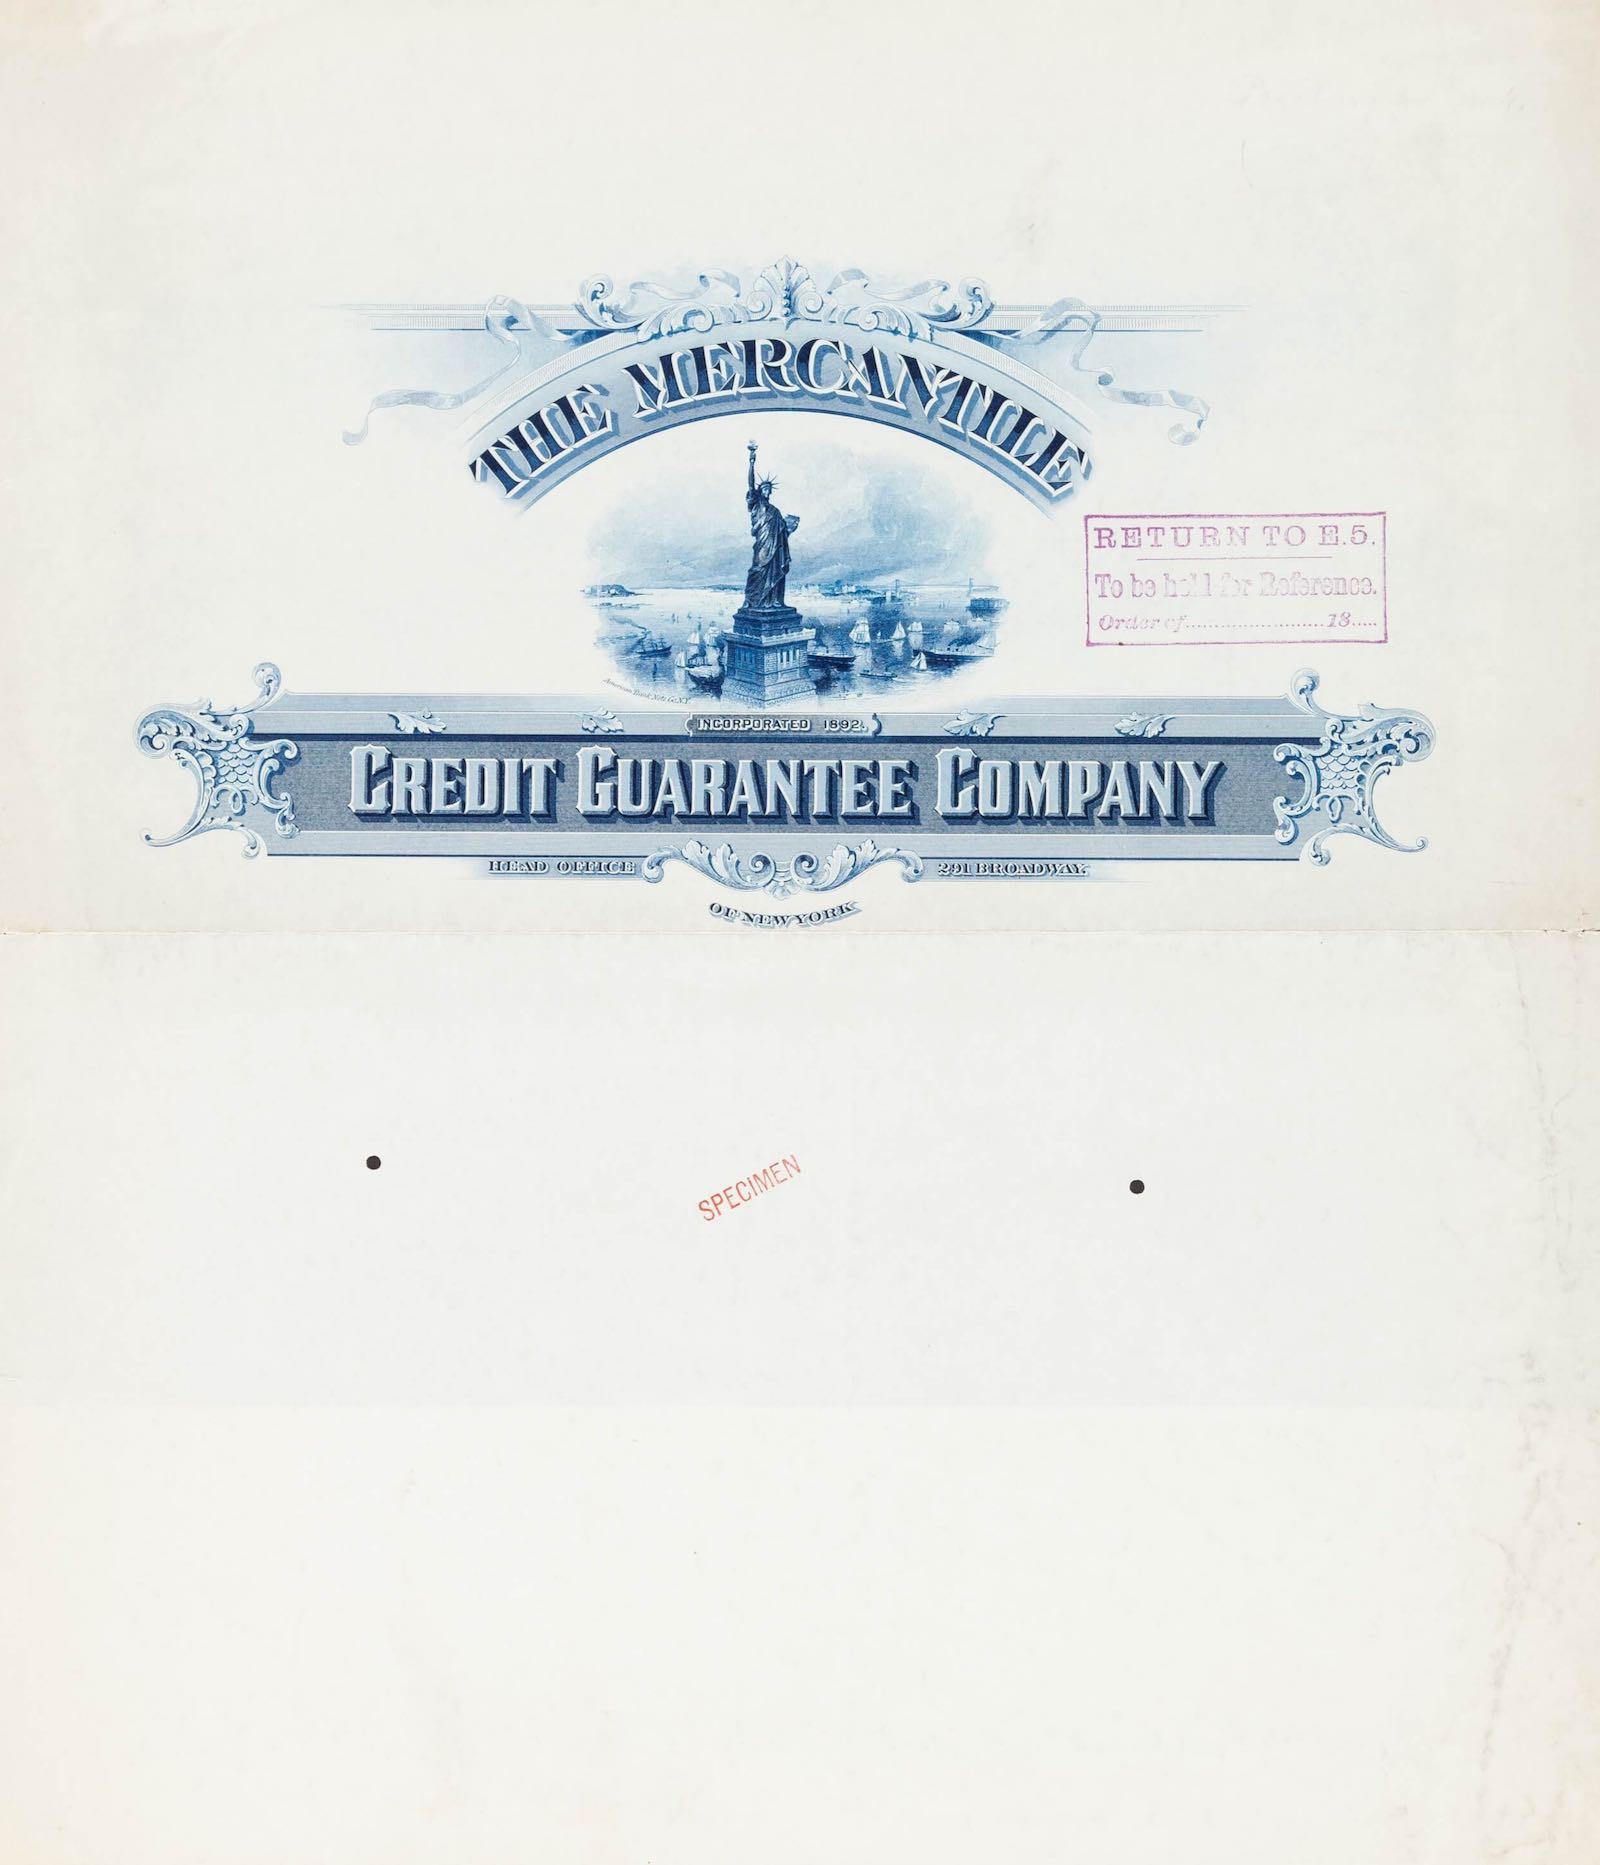 Mercantile Credit Guarantee Company_f1 (1).jpg